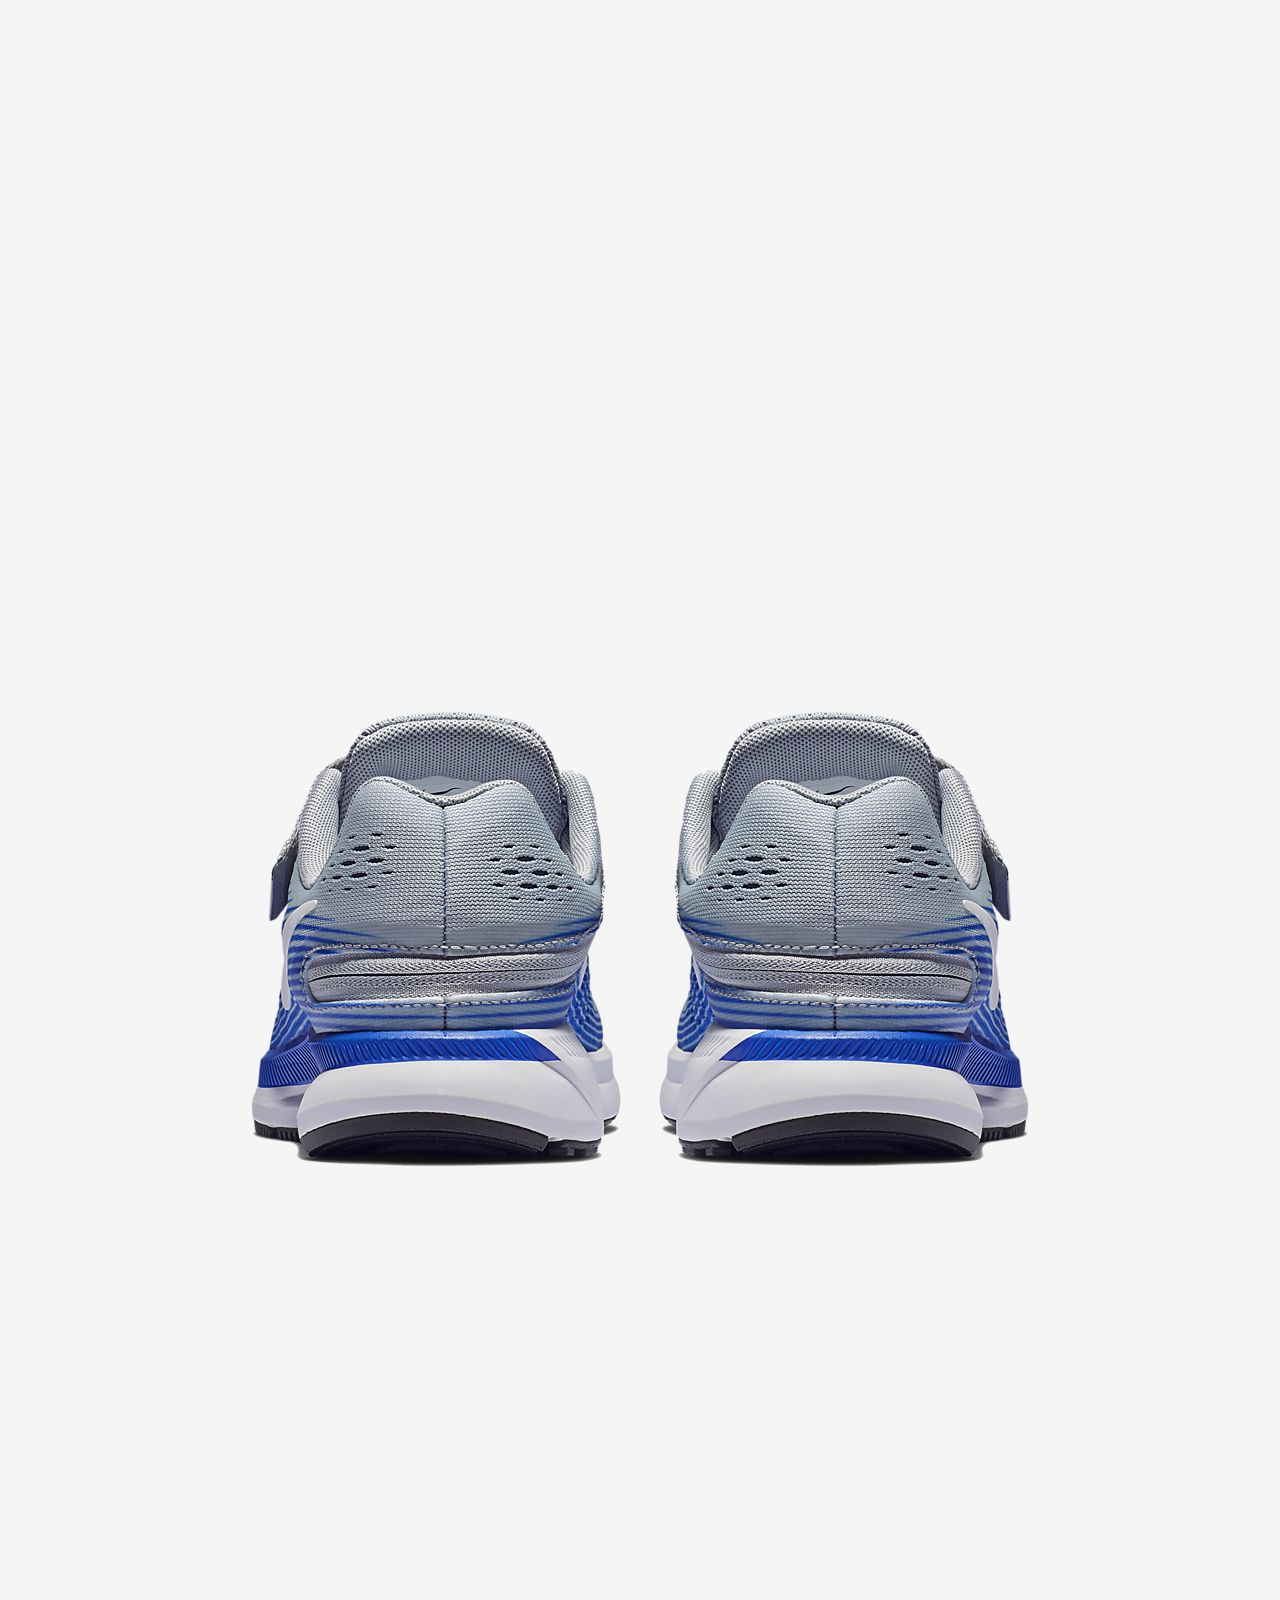 9cb6b6a2af461d Nike Zoom Pegasus 34 FlyEase Big Kids  Running Shoe. Nike.com